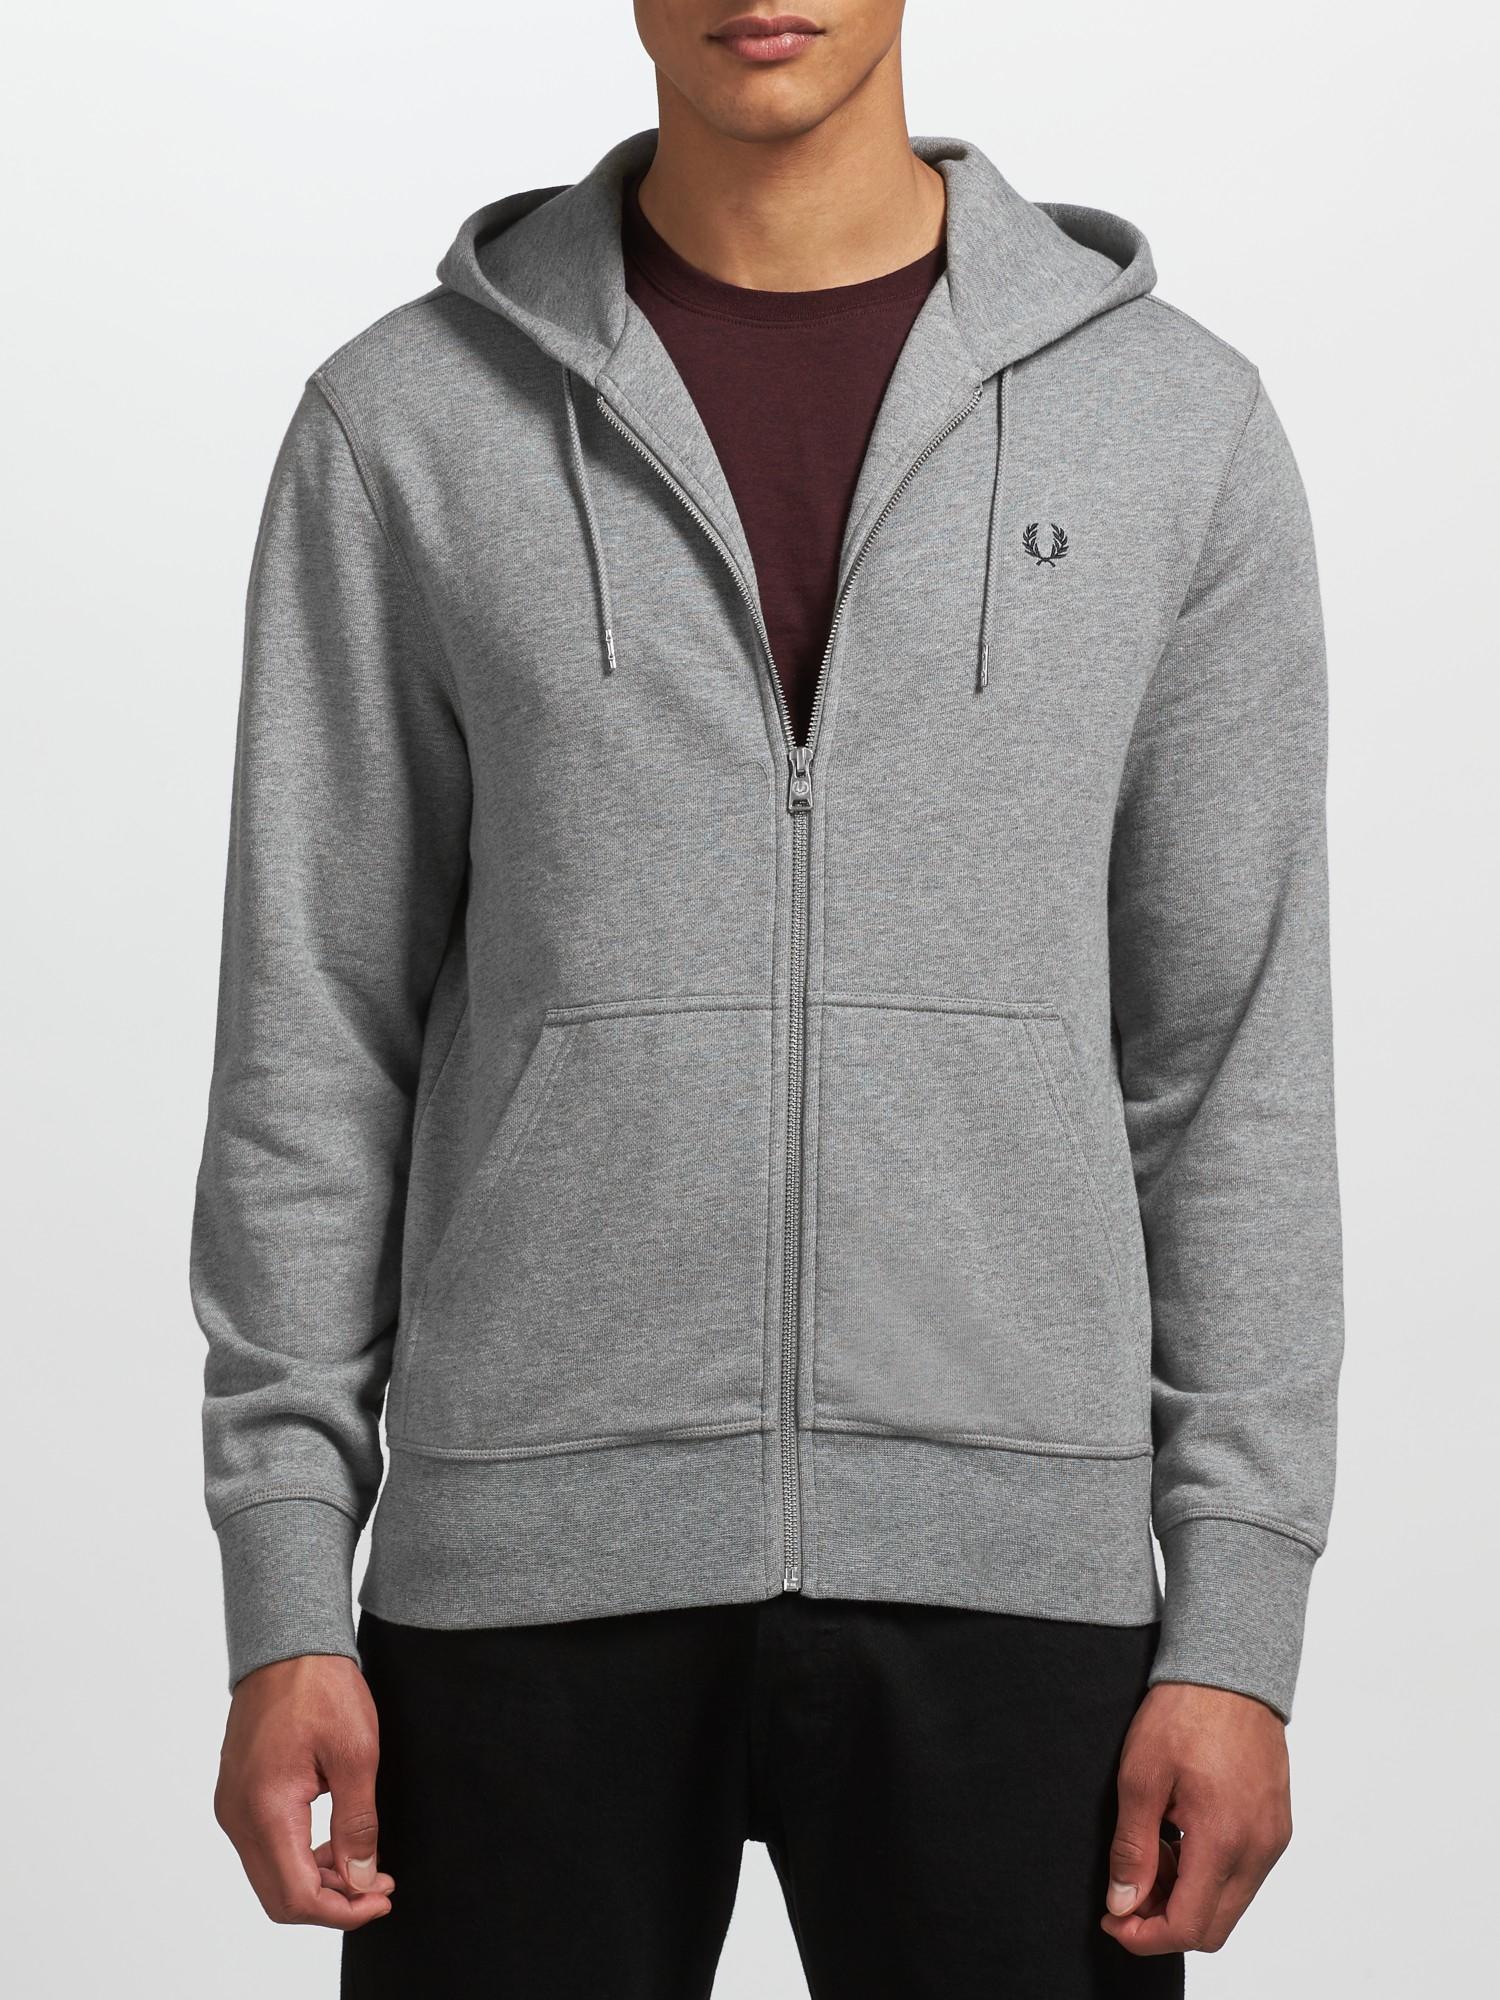 fred perry men s steel marl zip through sweatshirt s. Black Bedroom Furniture Sets. Home Design Ideas